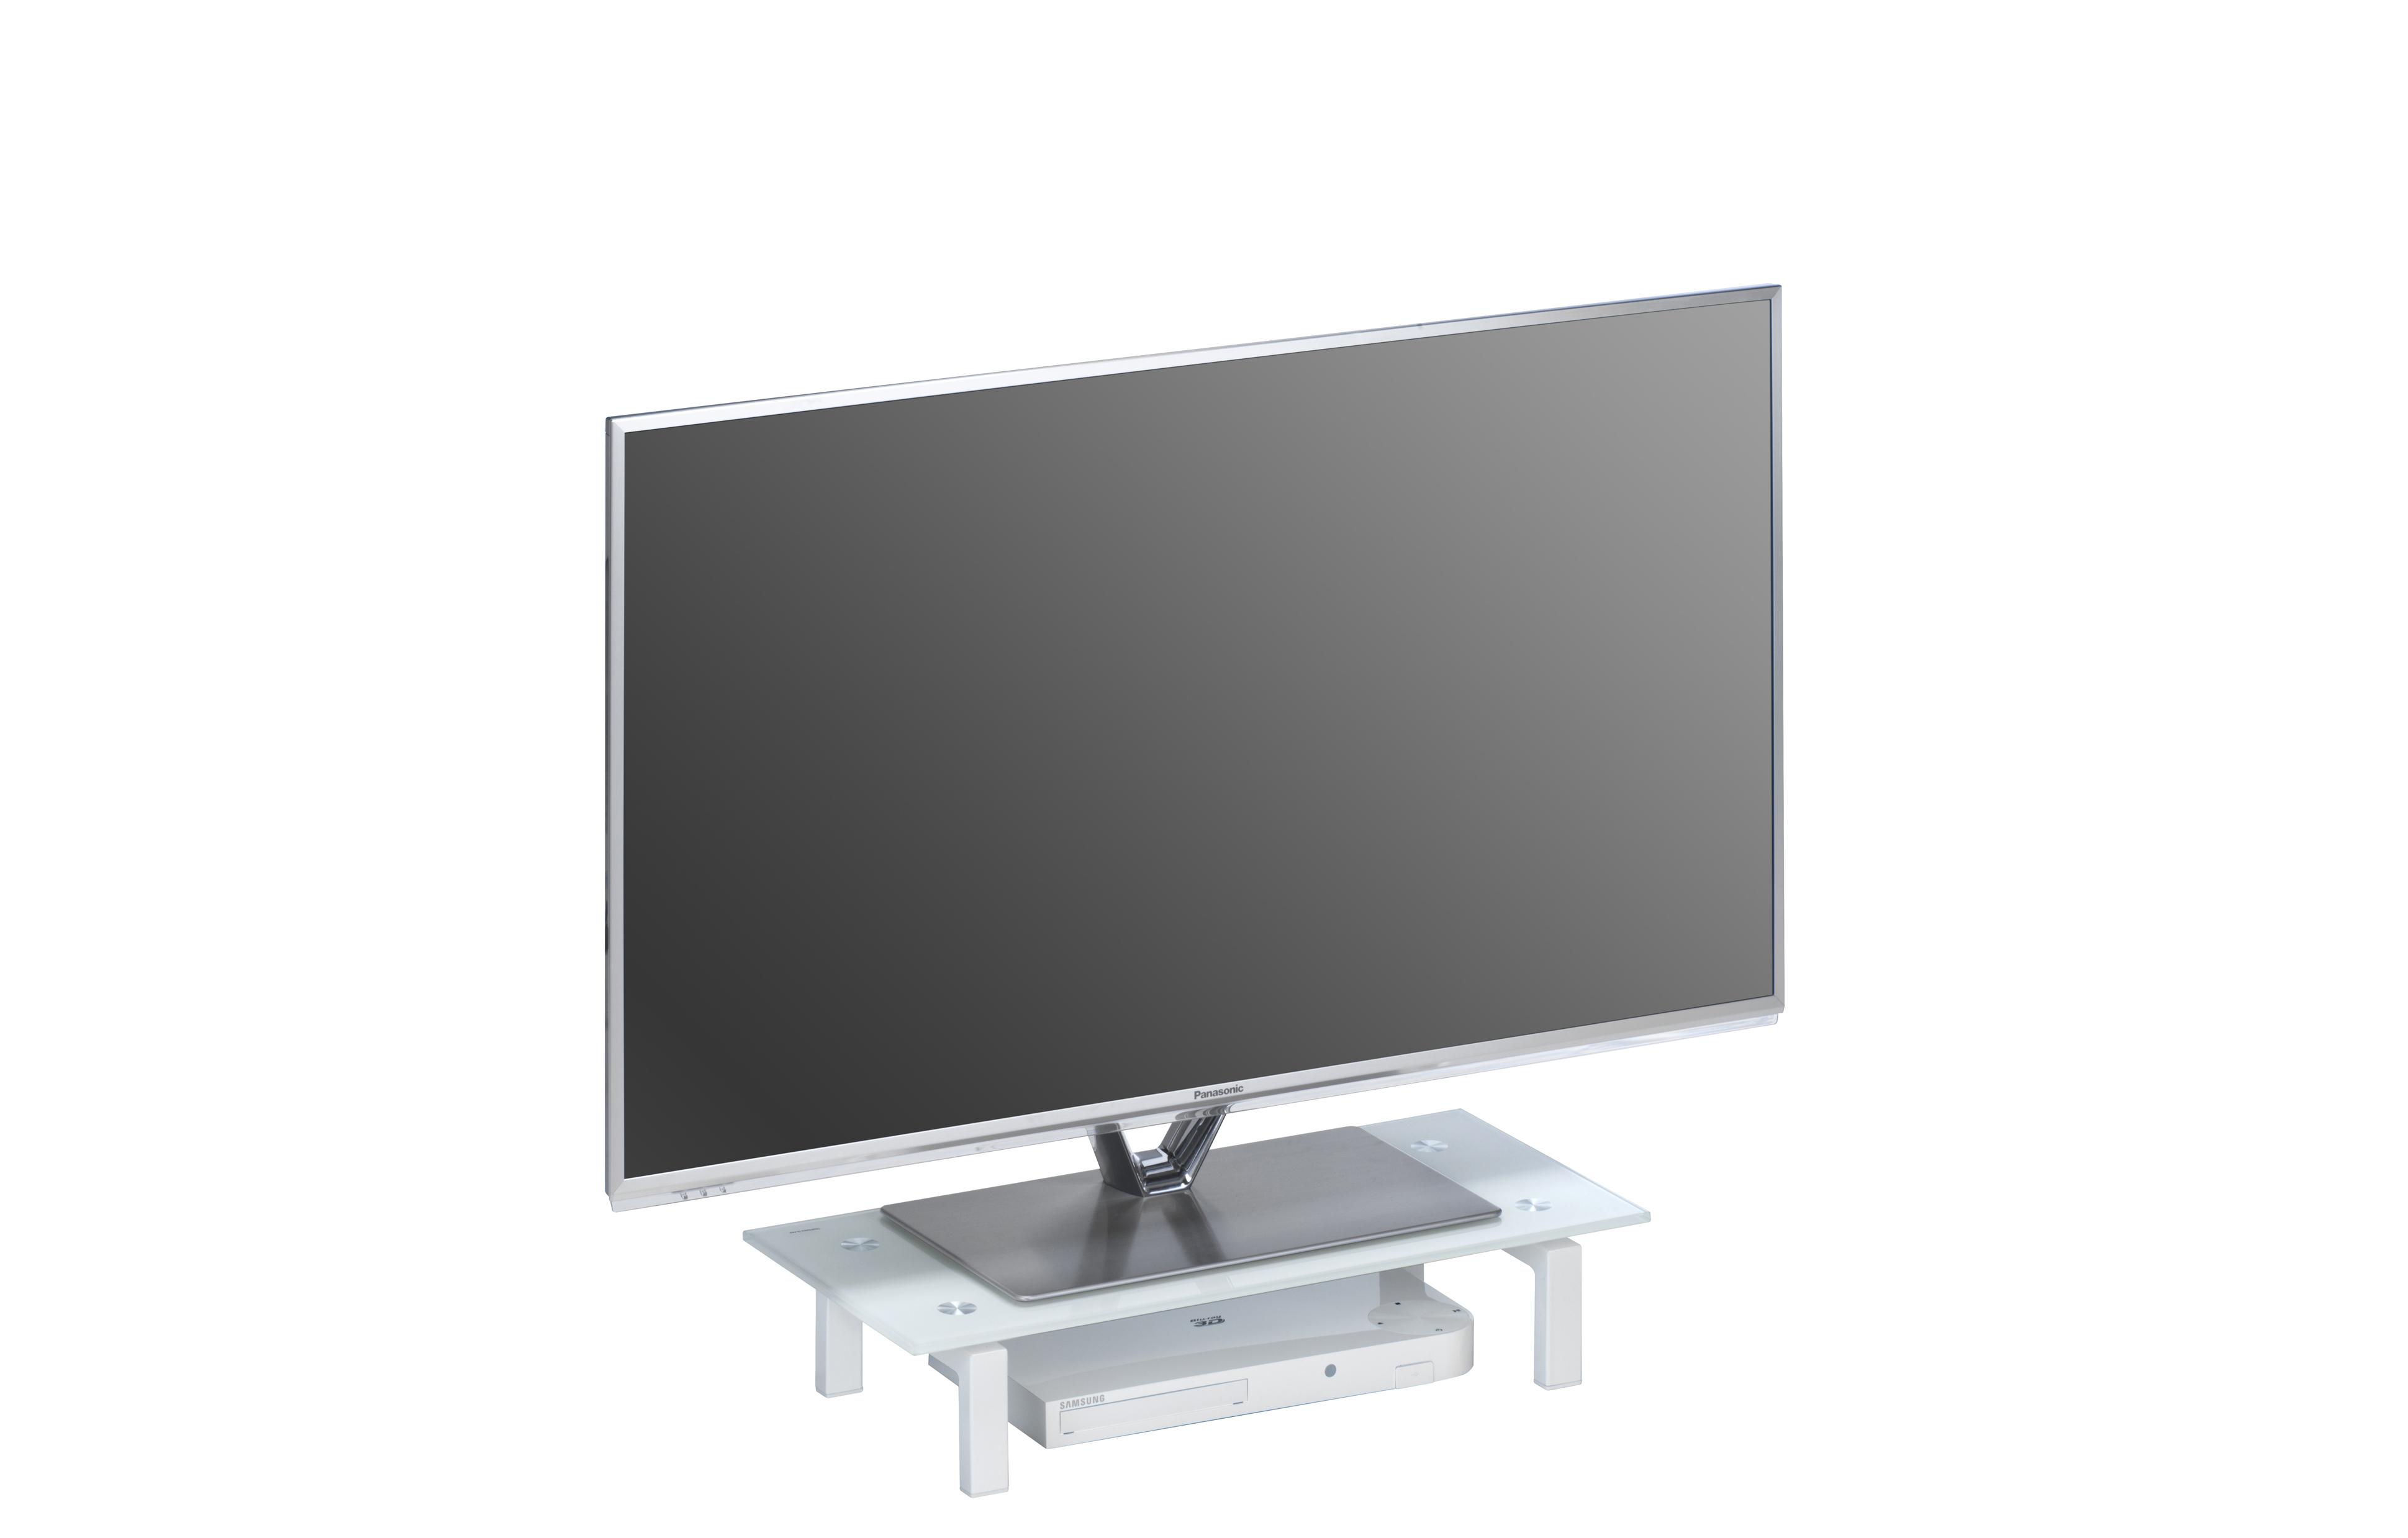 TV-Glasaufsatz Podest ca 60 cm breit Media 1602...